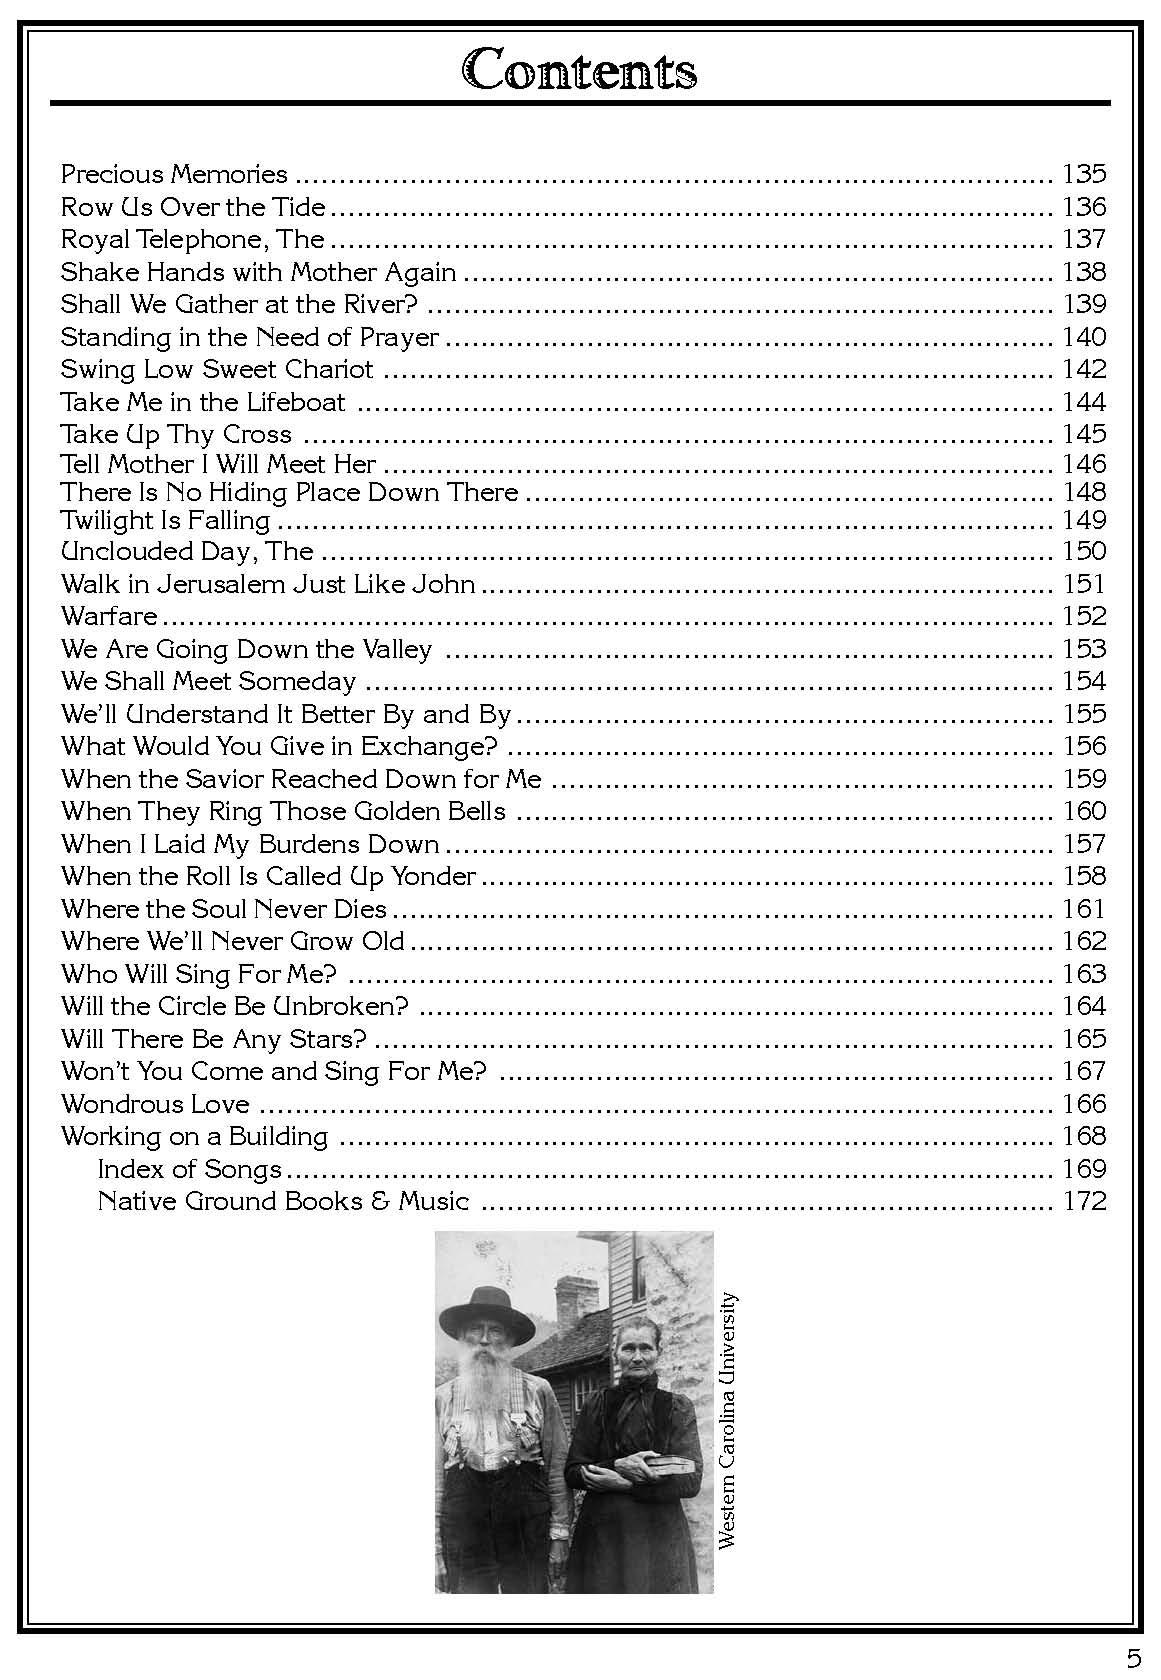 Gospel Hymn Book